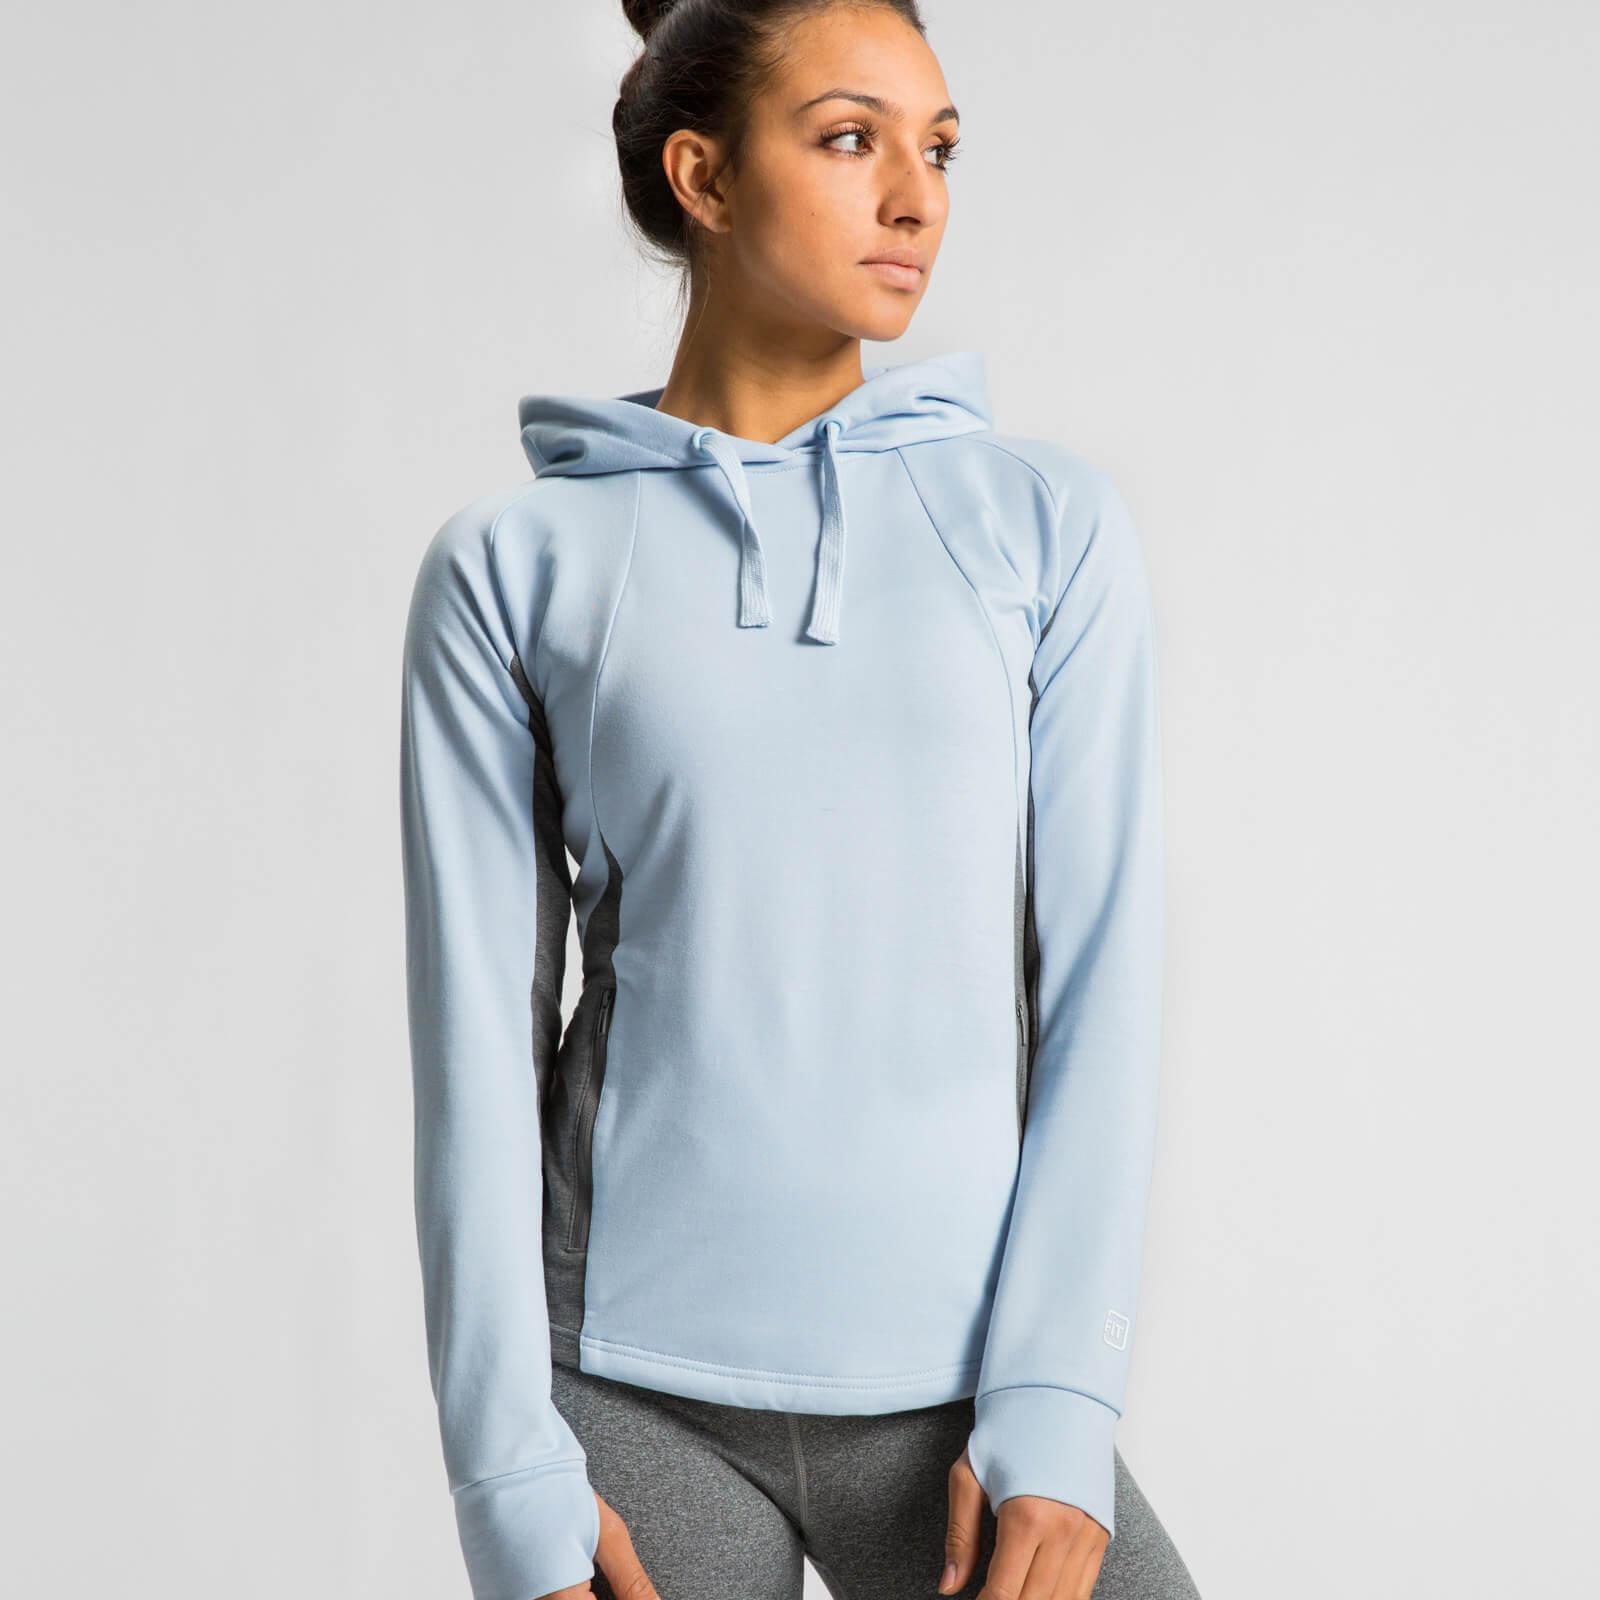 IdealFit Superlite Pullover Hoodie - Light Blue - XL - Blue